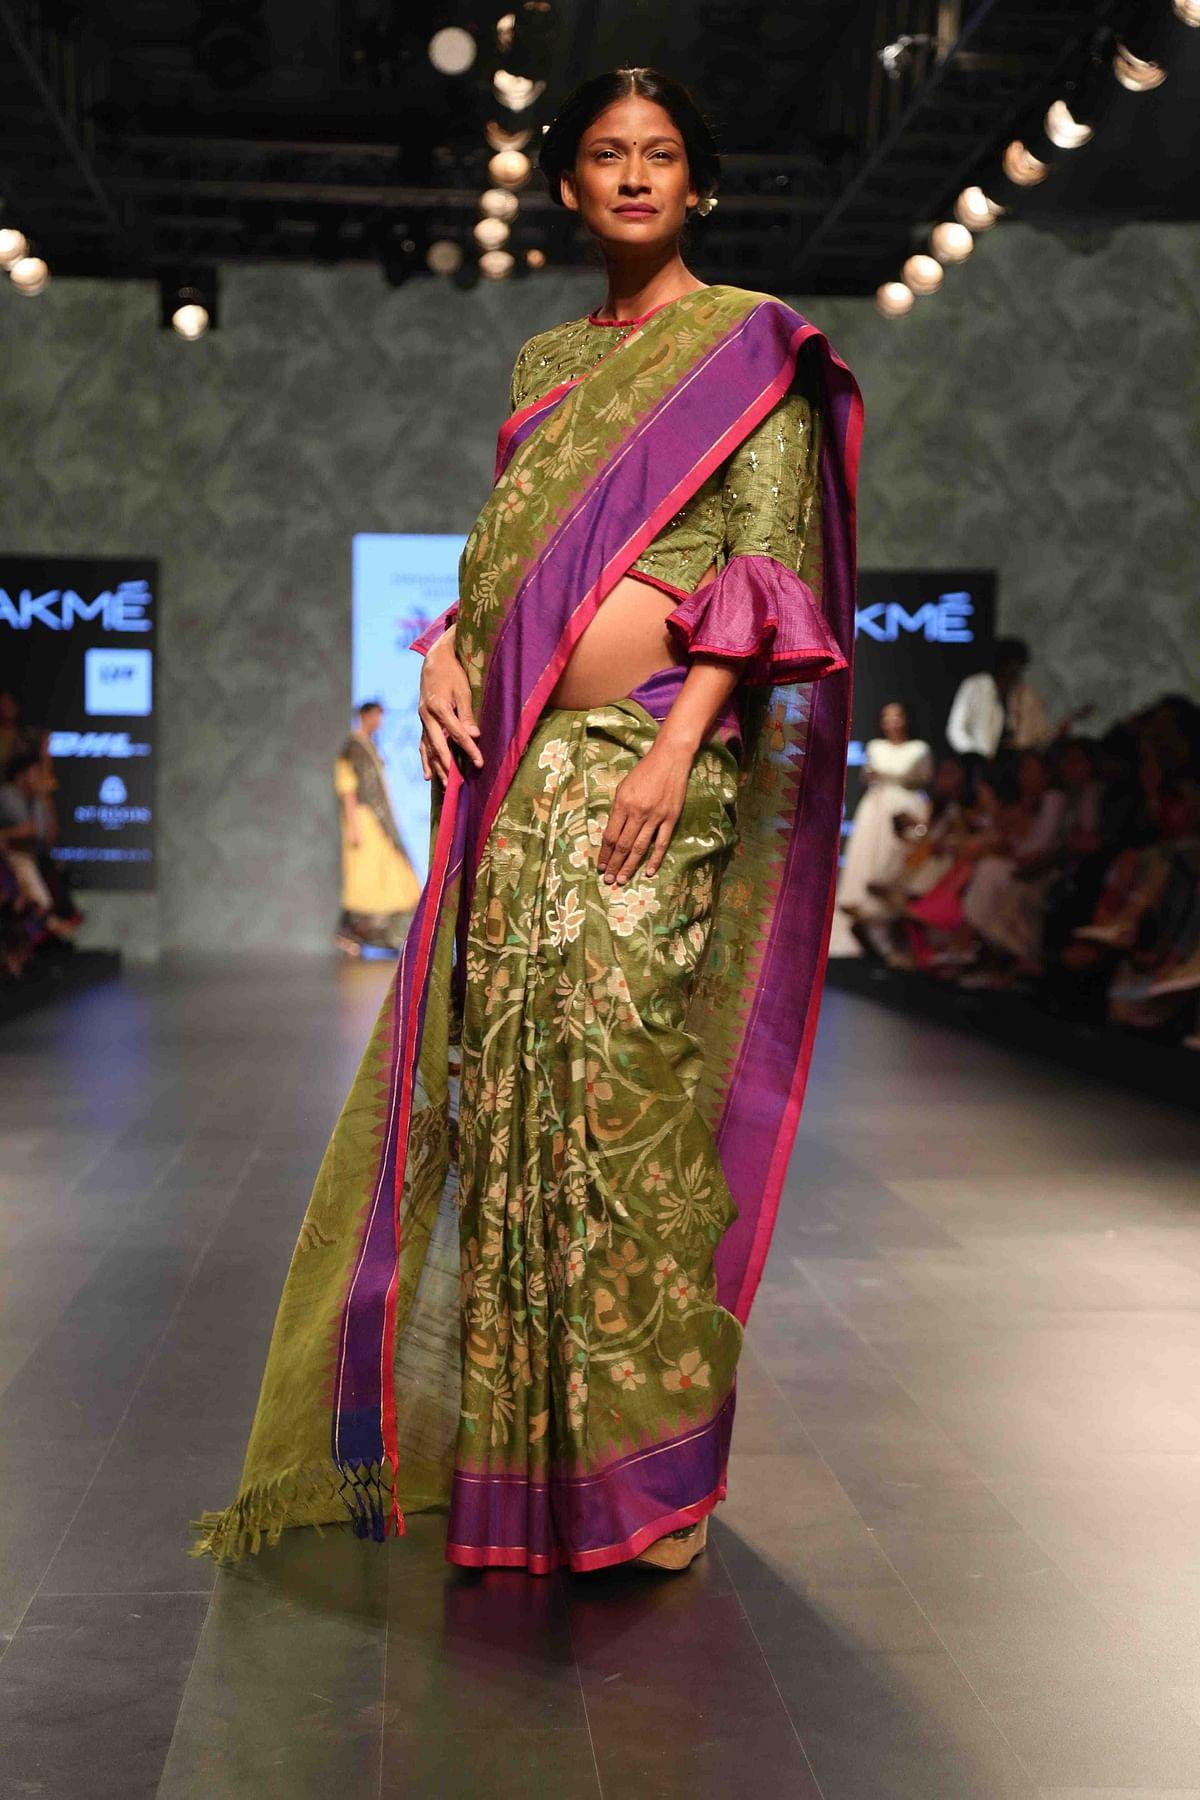 Carol Gracias walks at the Fashion Week for designer Gaurang Shah (Photo: Yogen Shah)